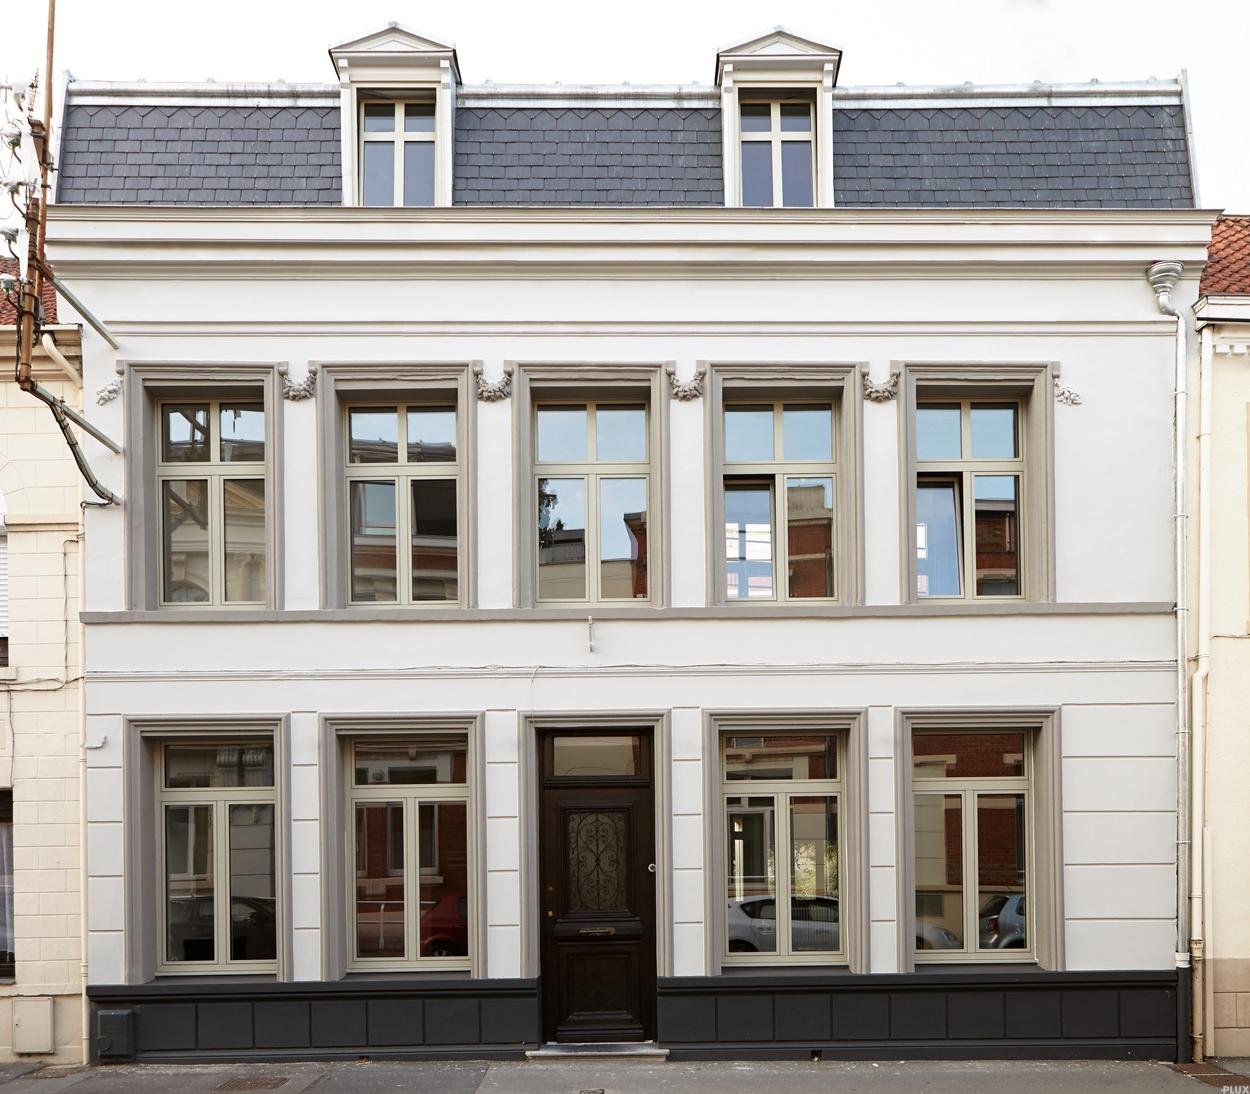 architecte lille plux restructuration maison bourgeoise nord 59. Black Bedroom Furniture Sets. Home Design Ideas